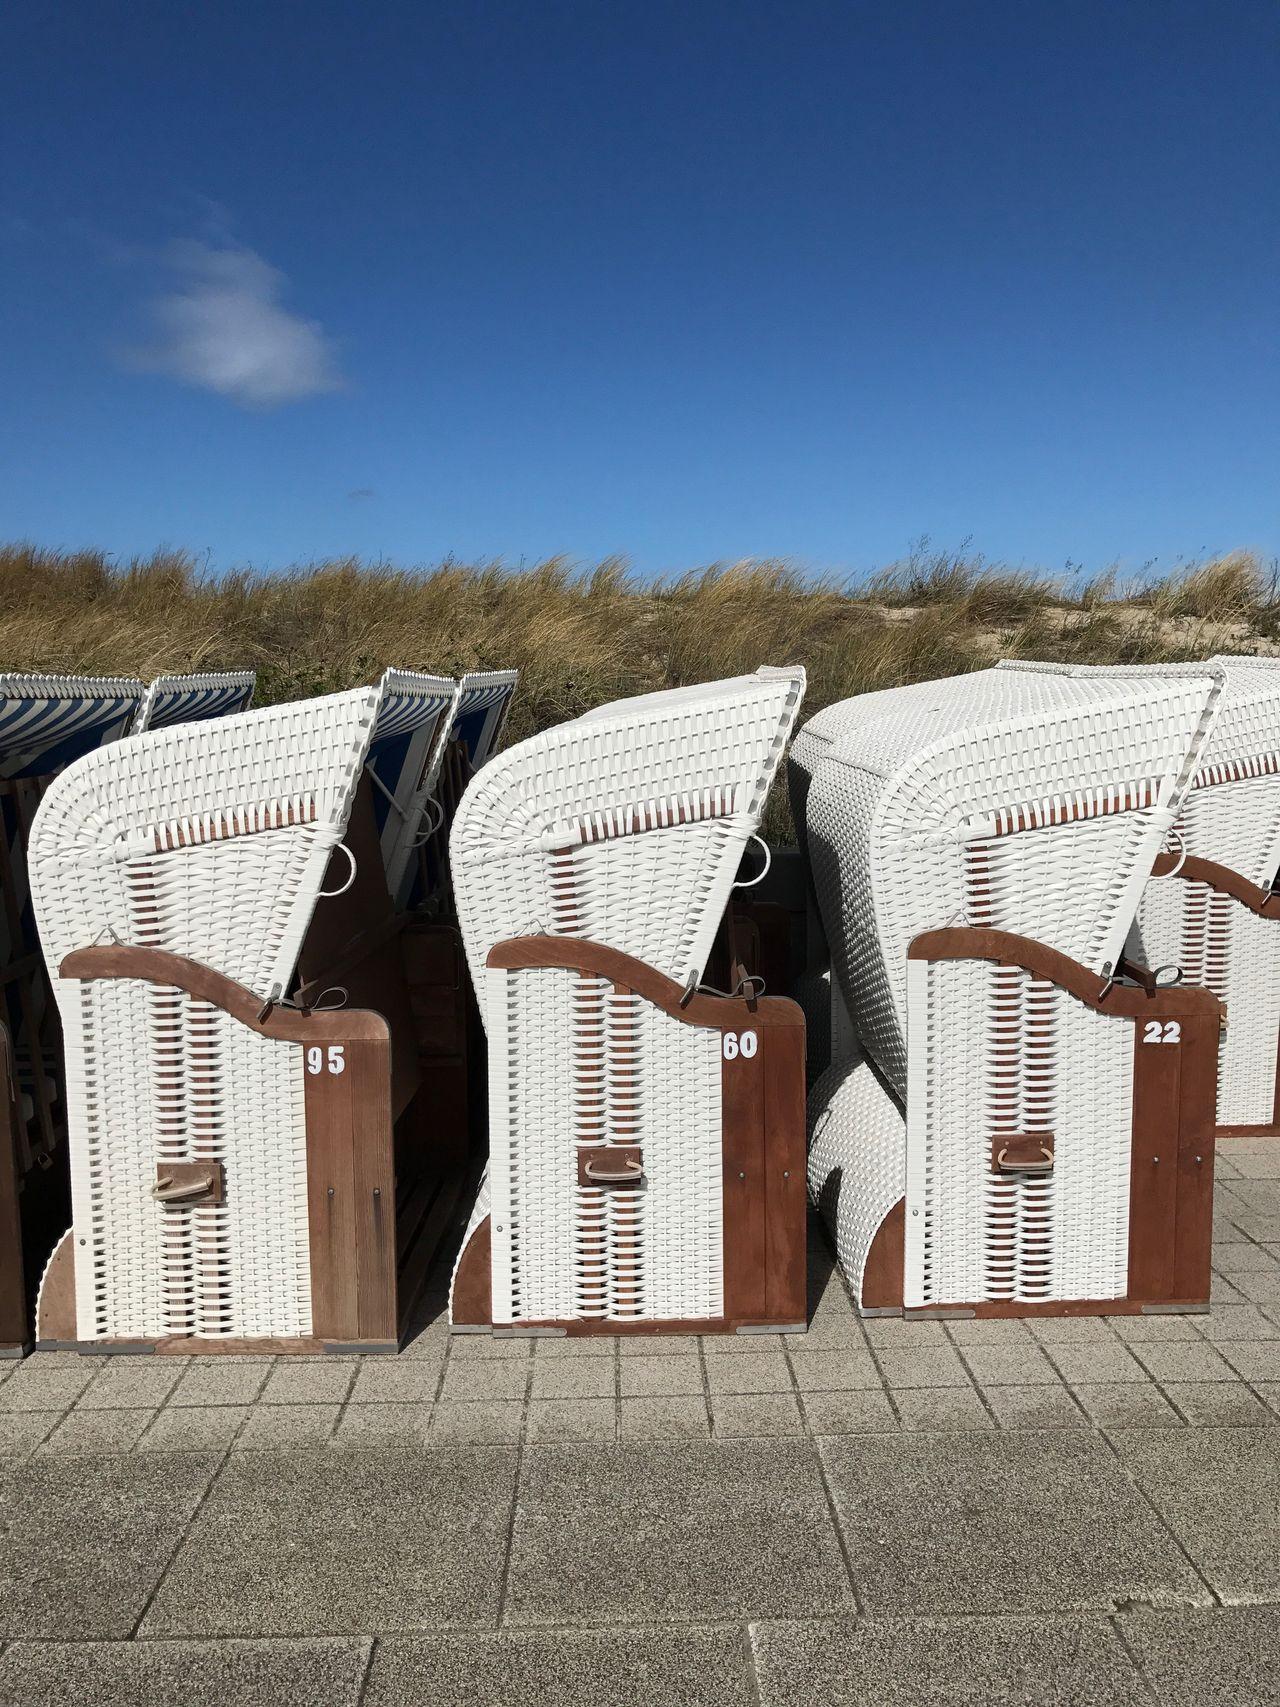 Day Outdoors No People Sand Beach Chair Sunlight Seat Sky Nature Beachchairs Beachchair Beach Chairs